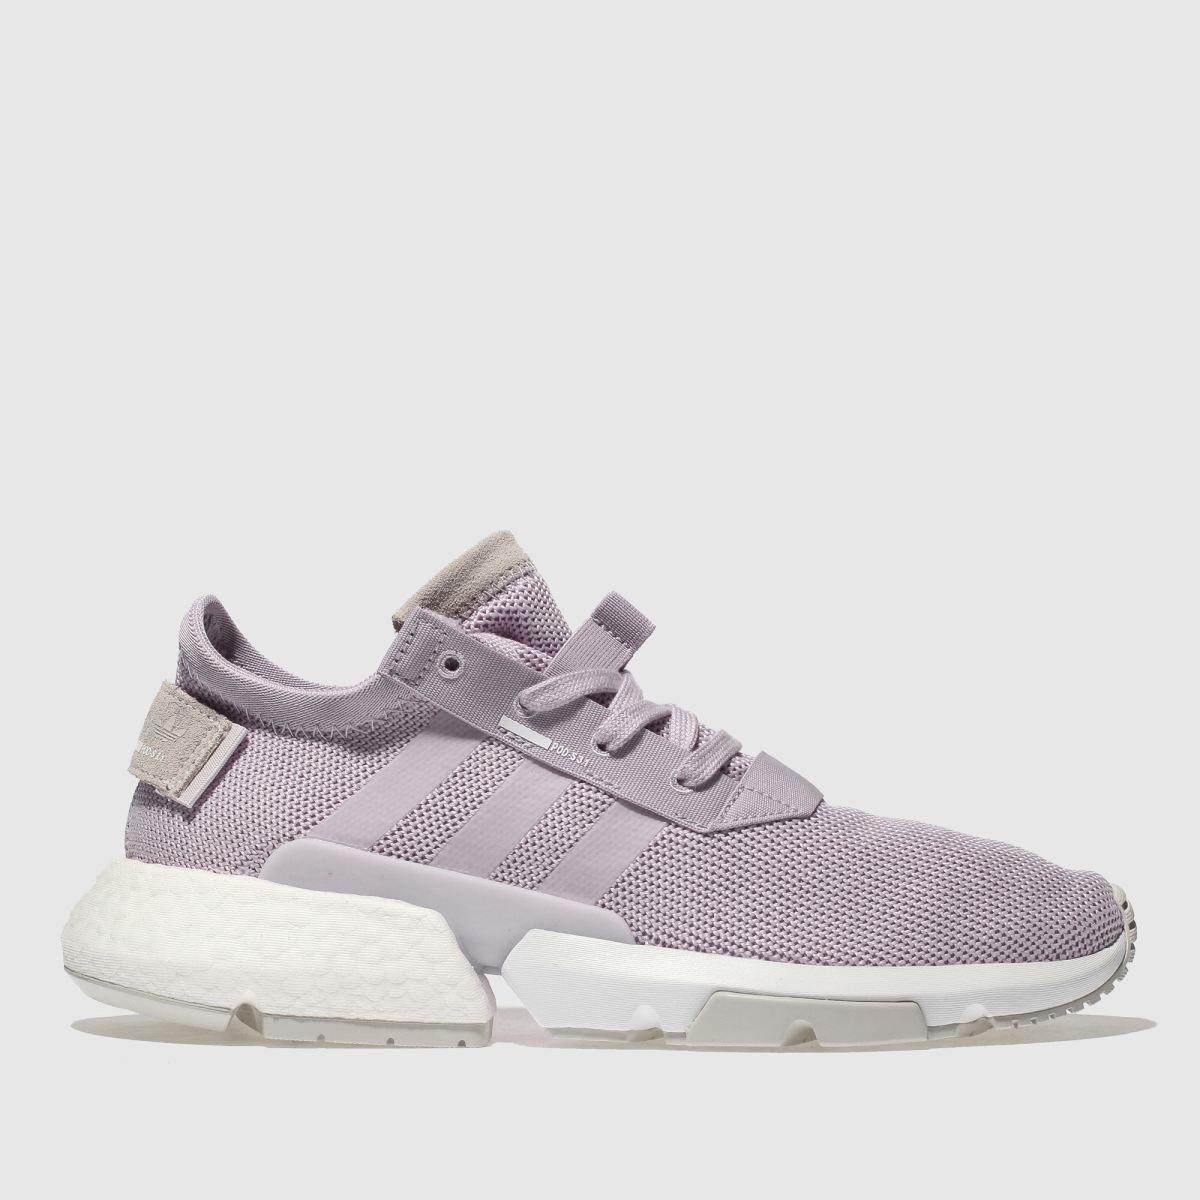 Adidas Lilac Pod-s3.1 Trainers